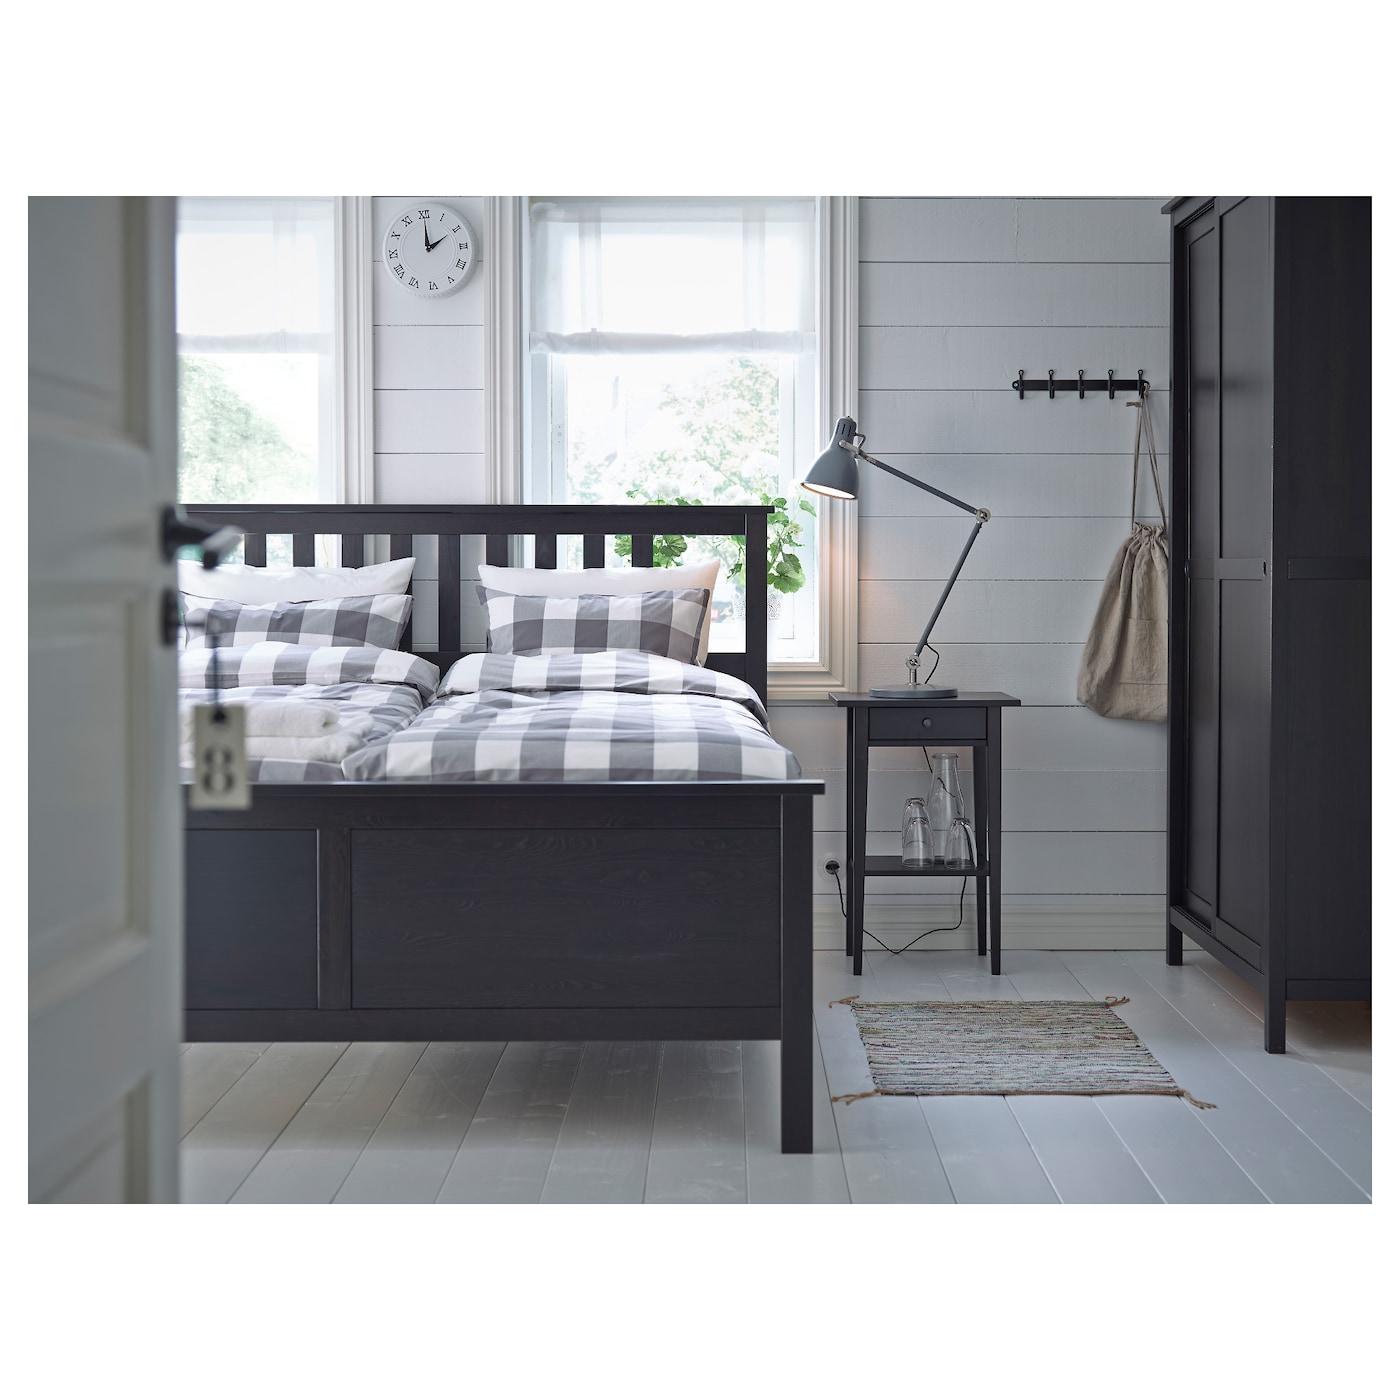 Hemnes Nightstand Black Brown 18 1 8x13 3 4 Ikea